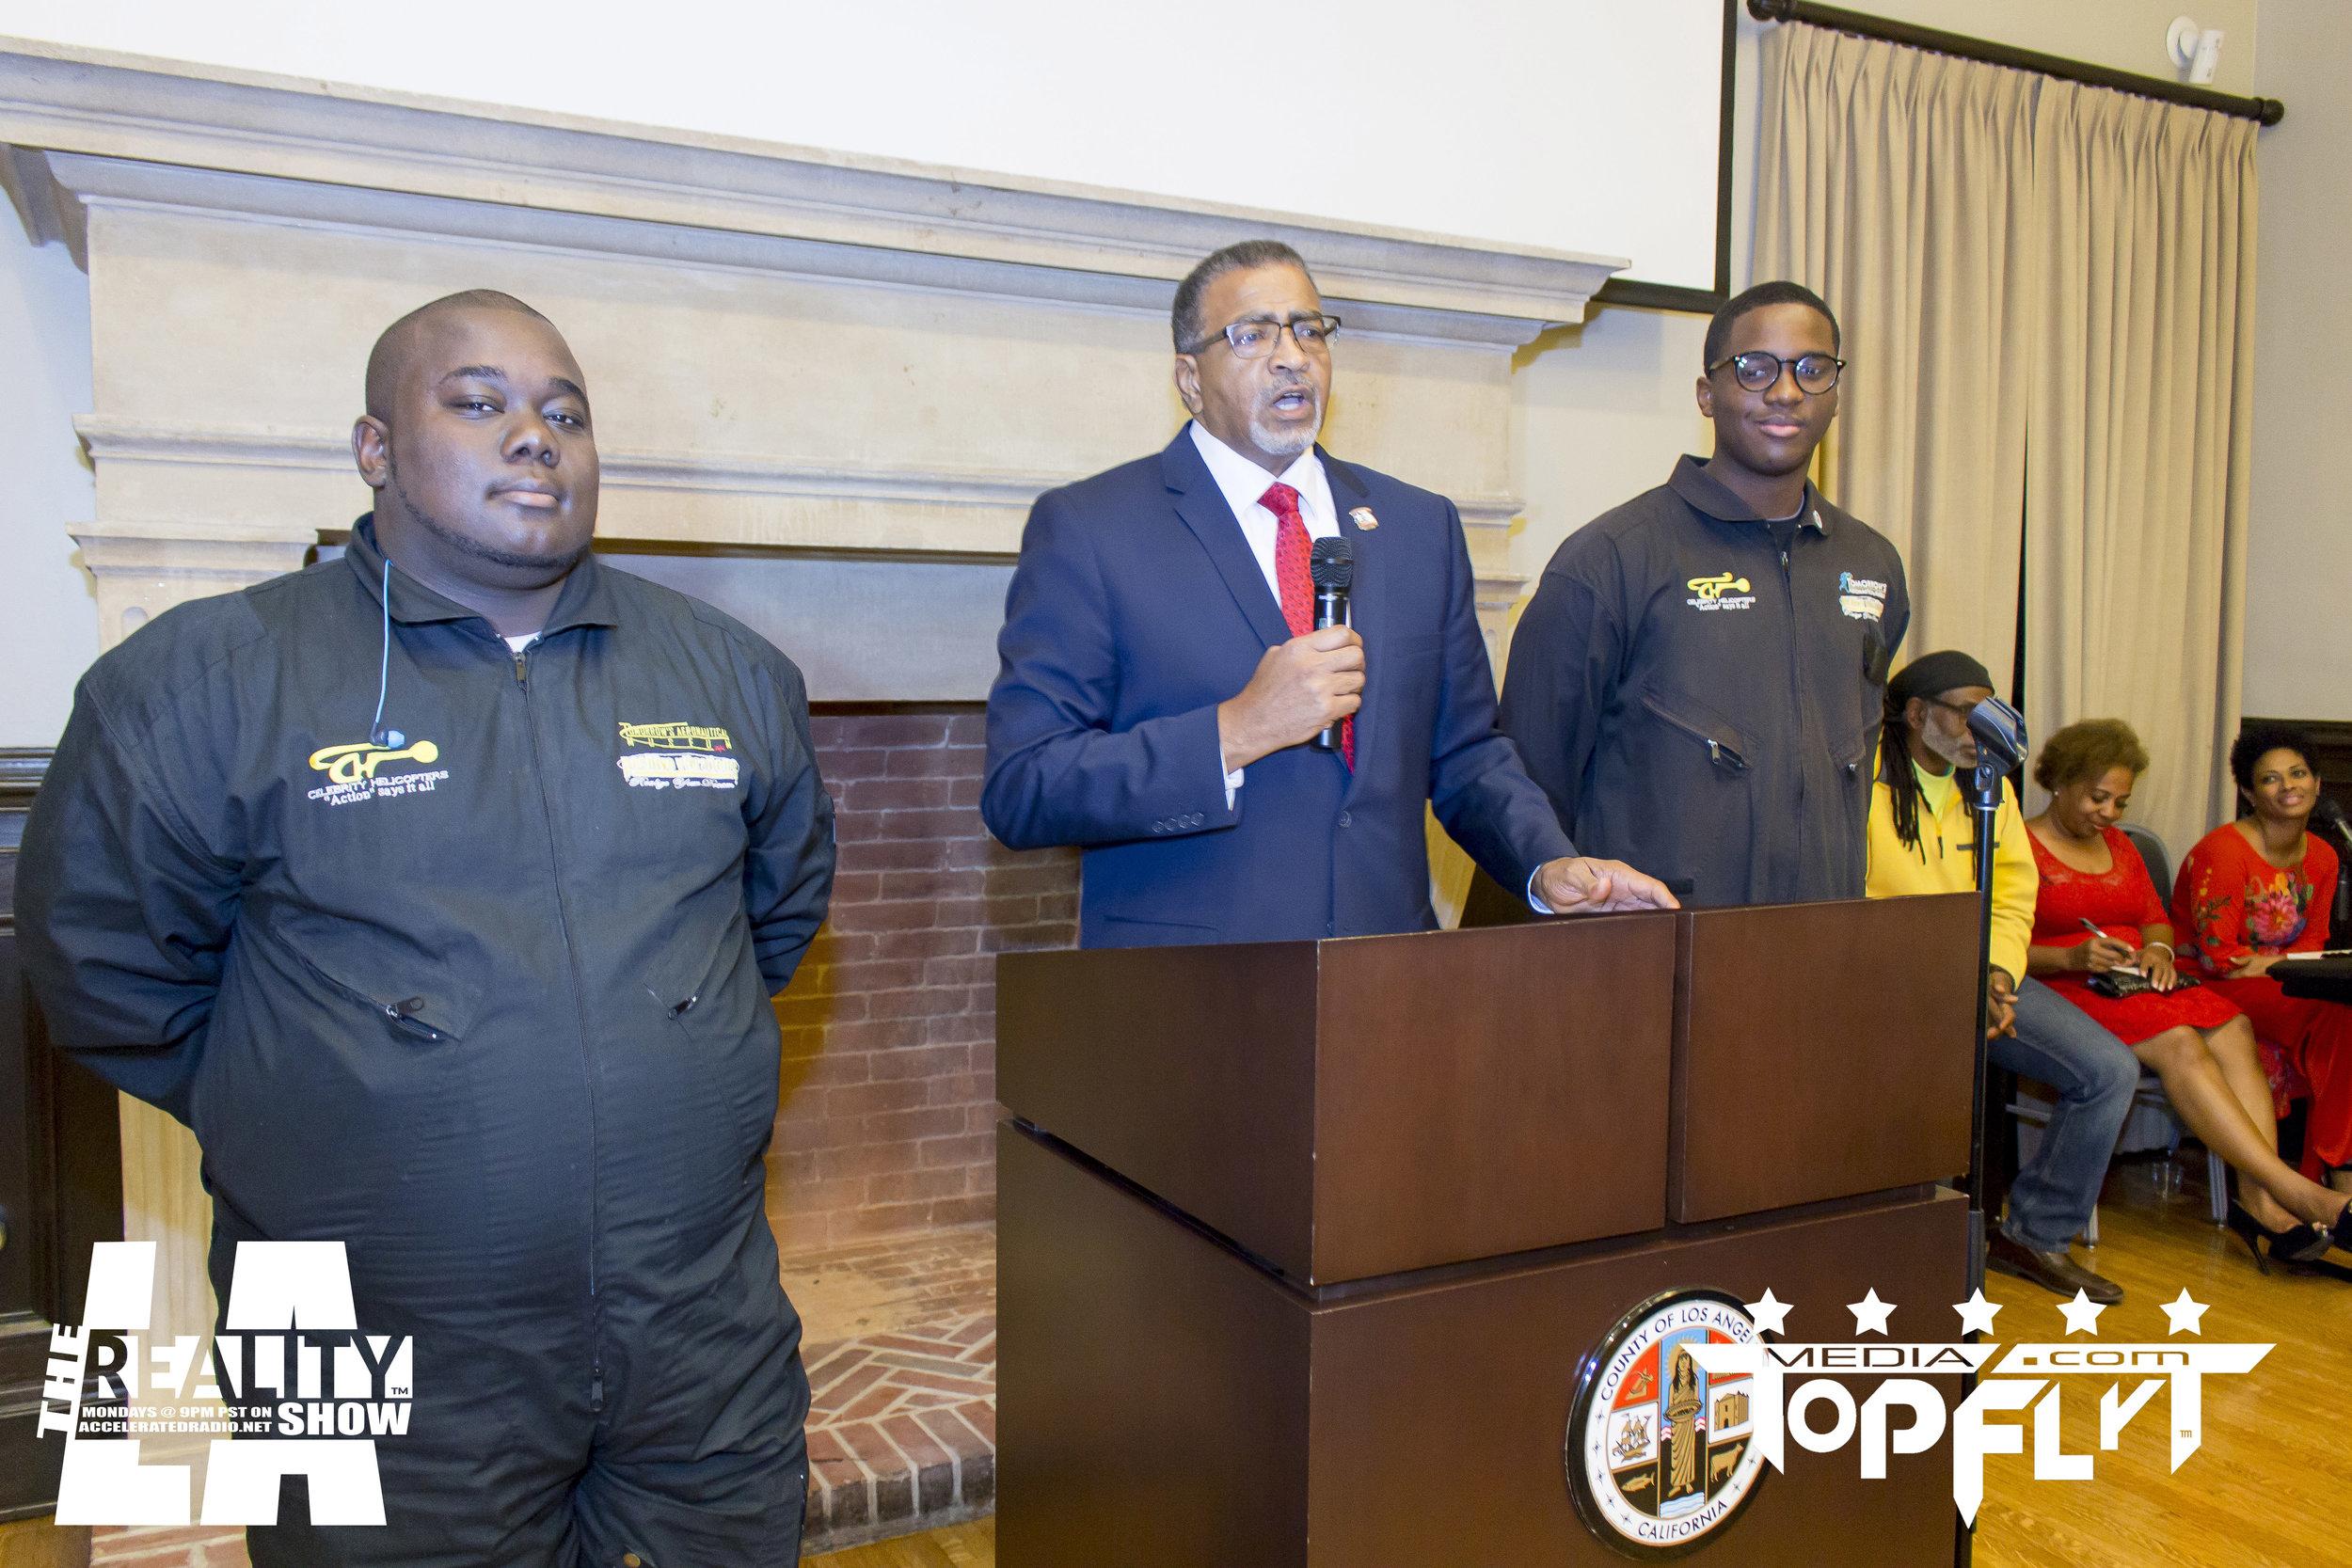 The Reality Show LA - Tuskegee Airmen 75th Anniversary VIP Reception_142.jpg